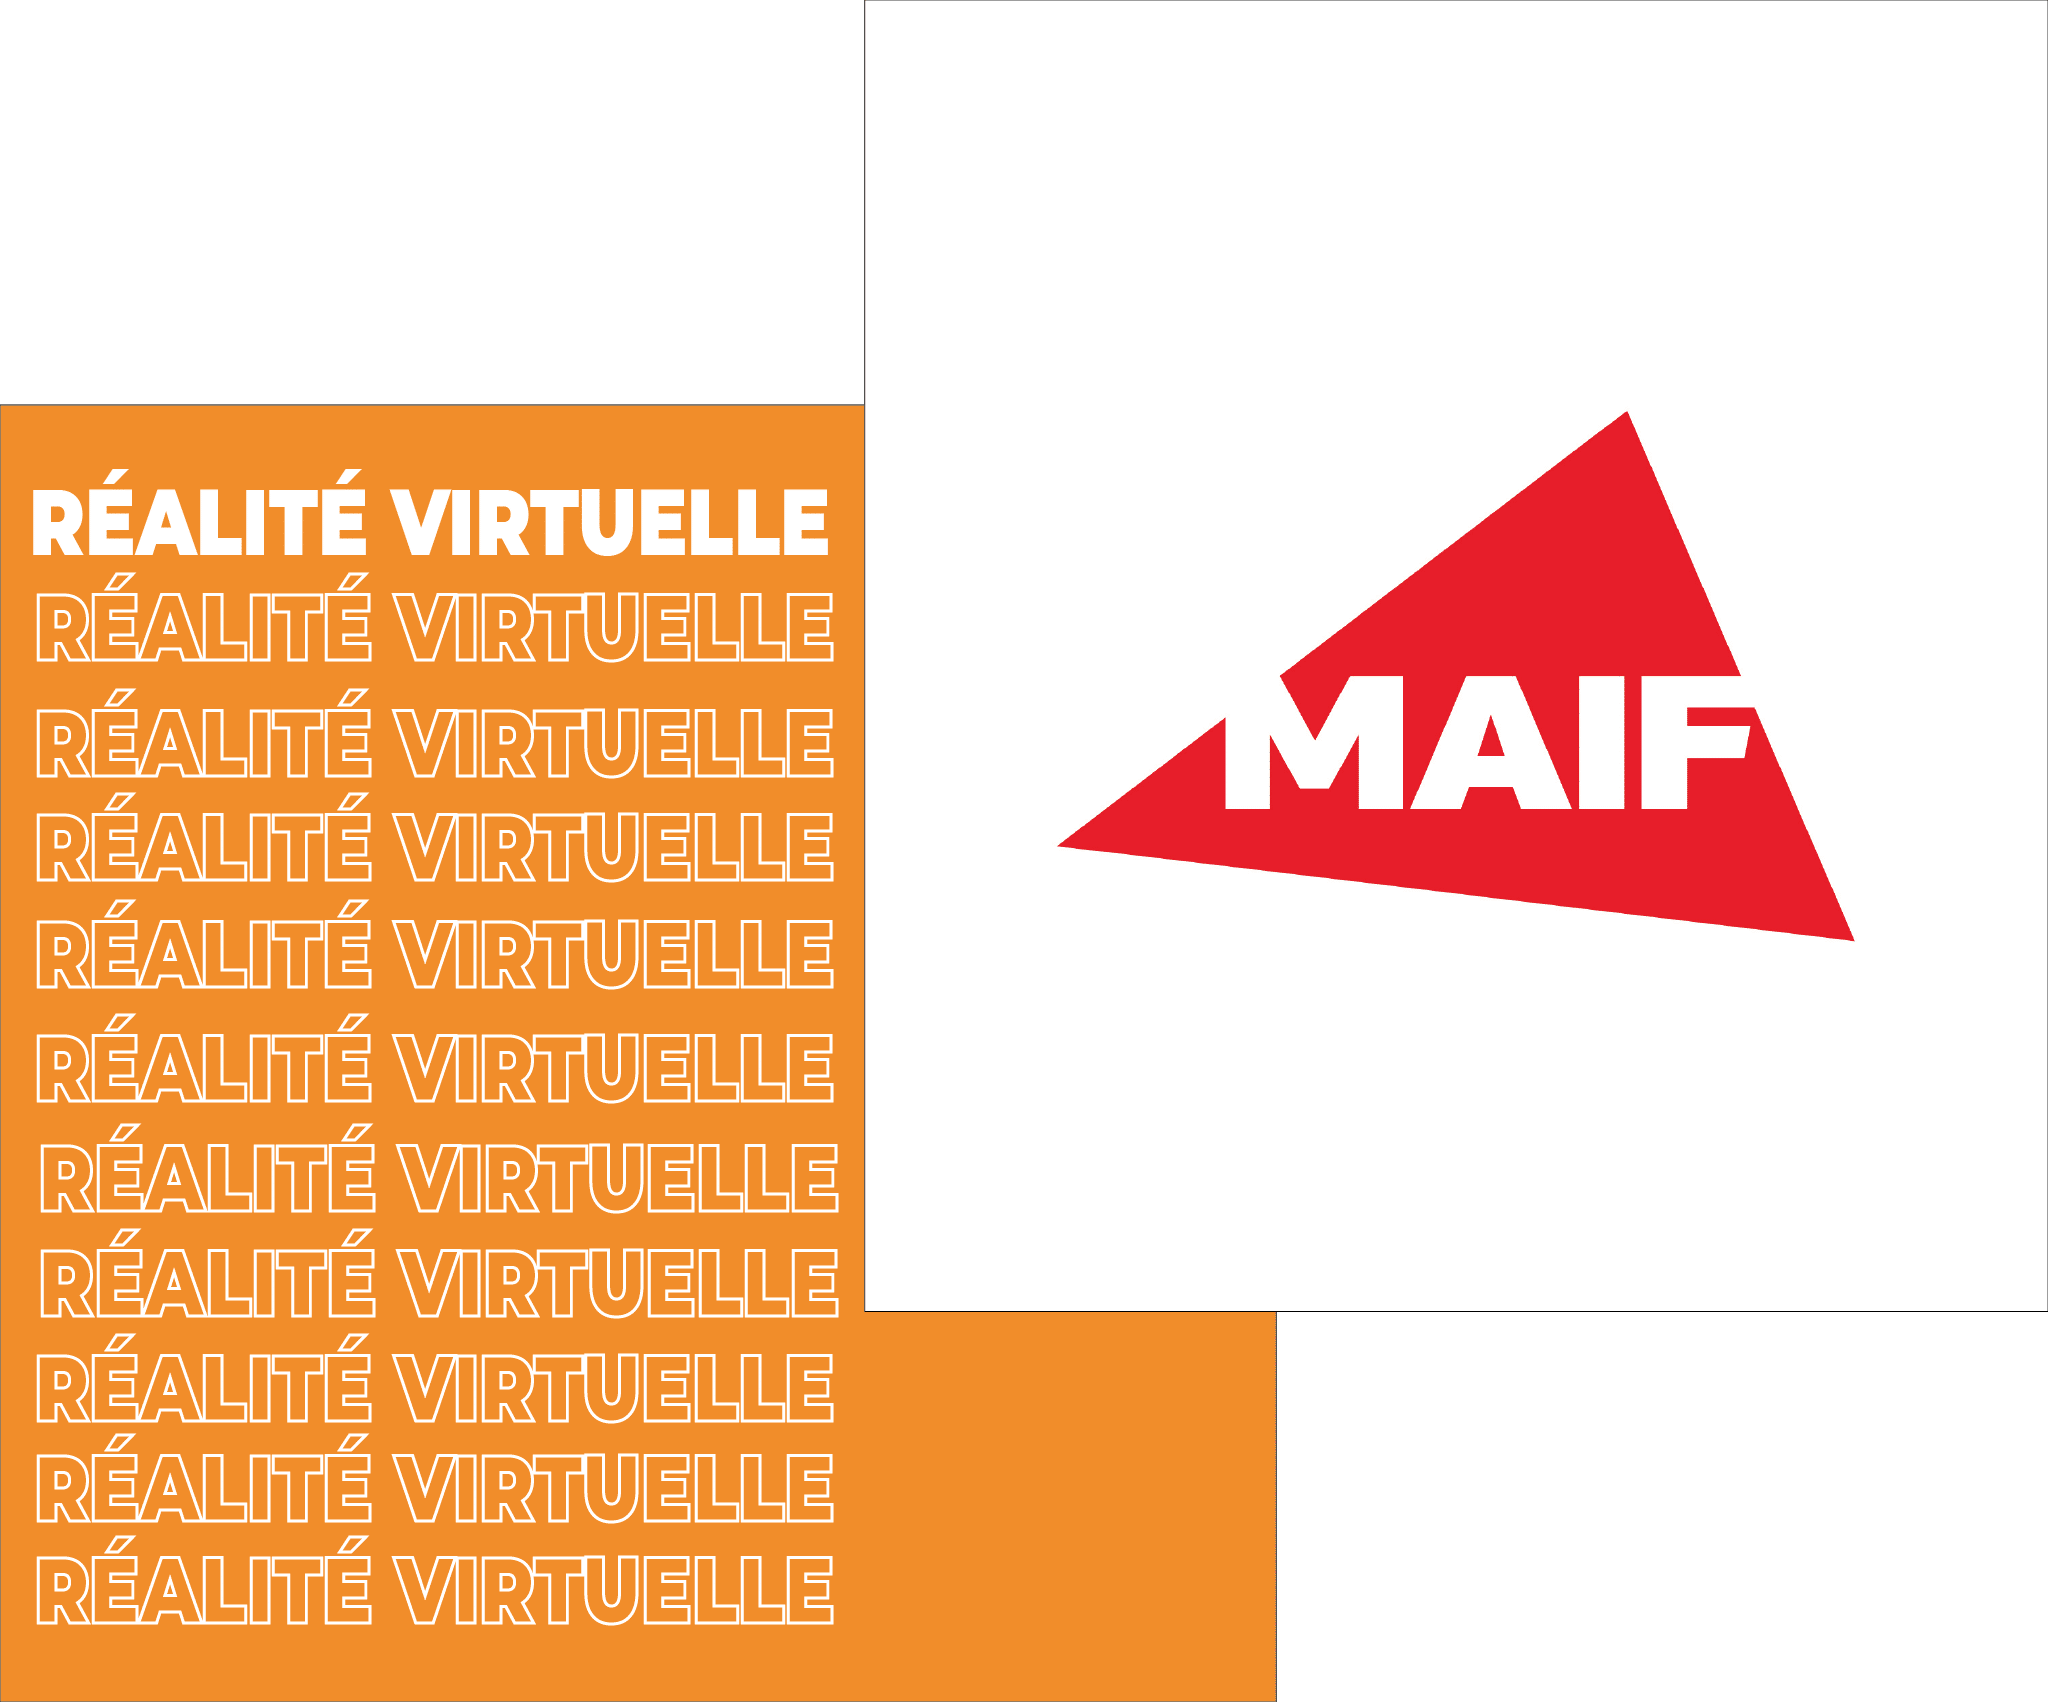 logo Maif Réalité virtuelle